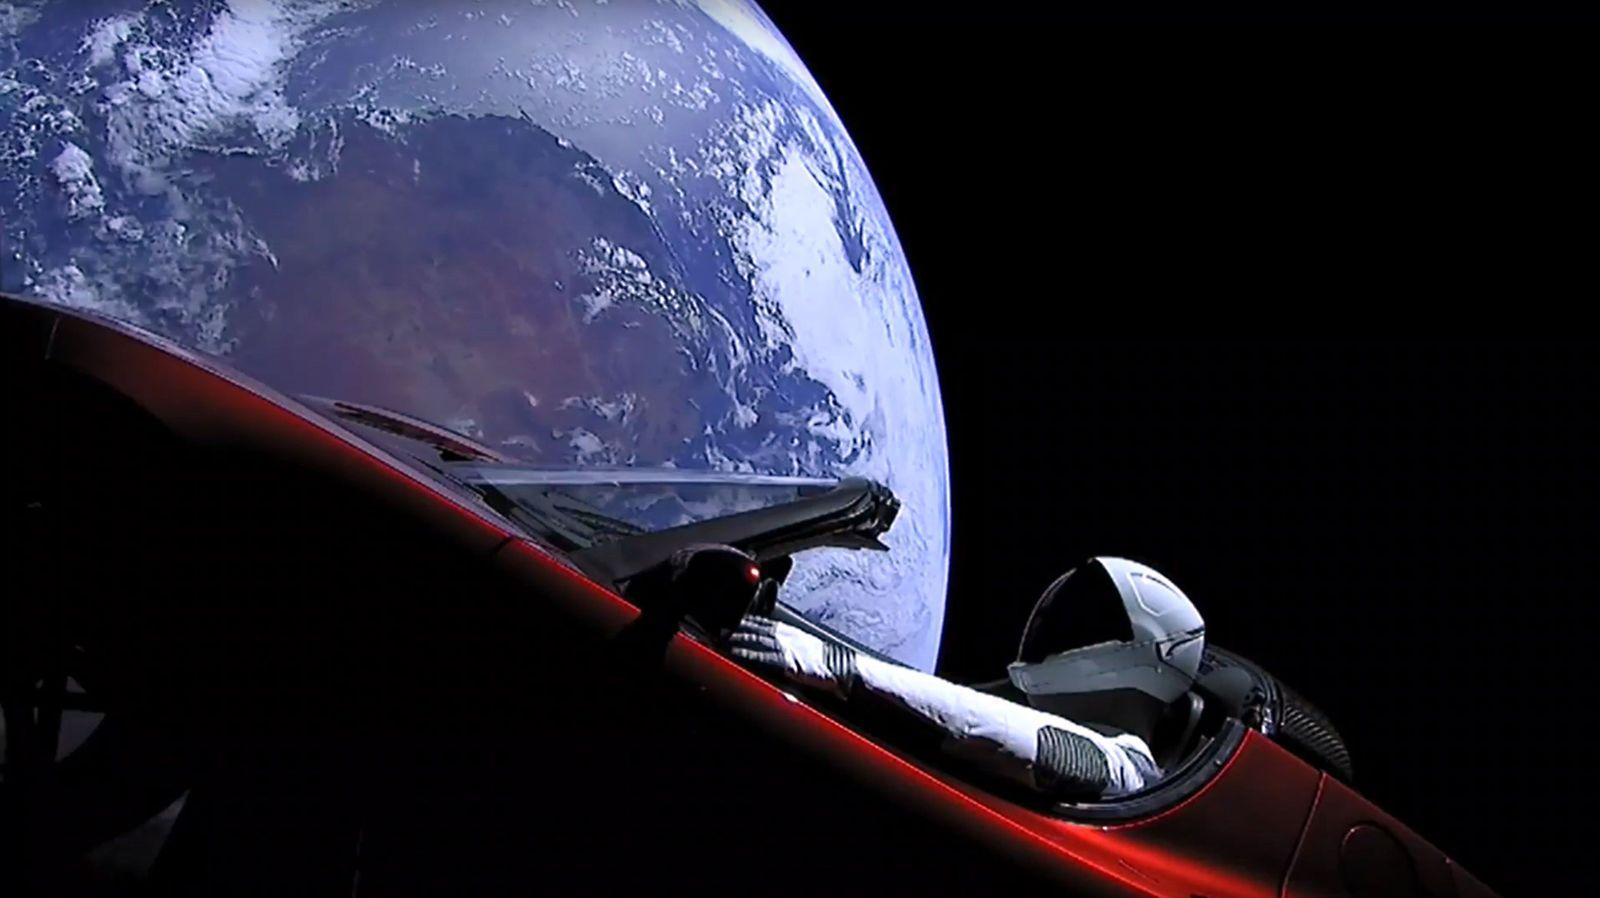 SpaceX CEO Elon Musks / Tesla